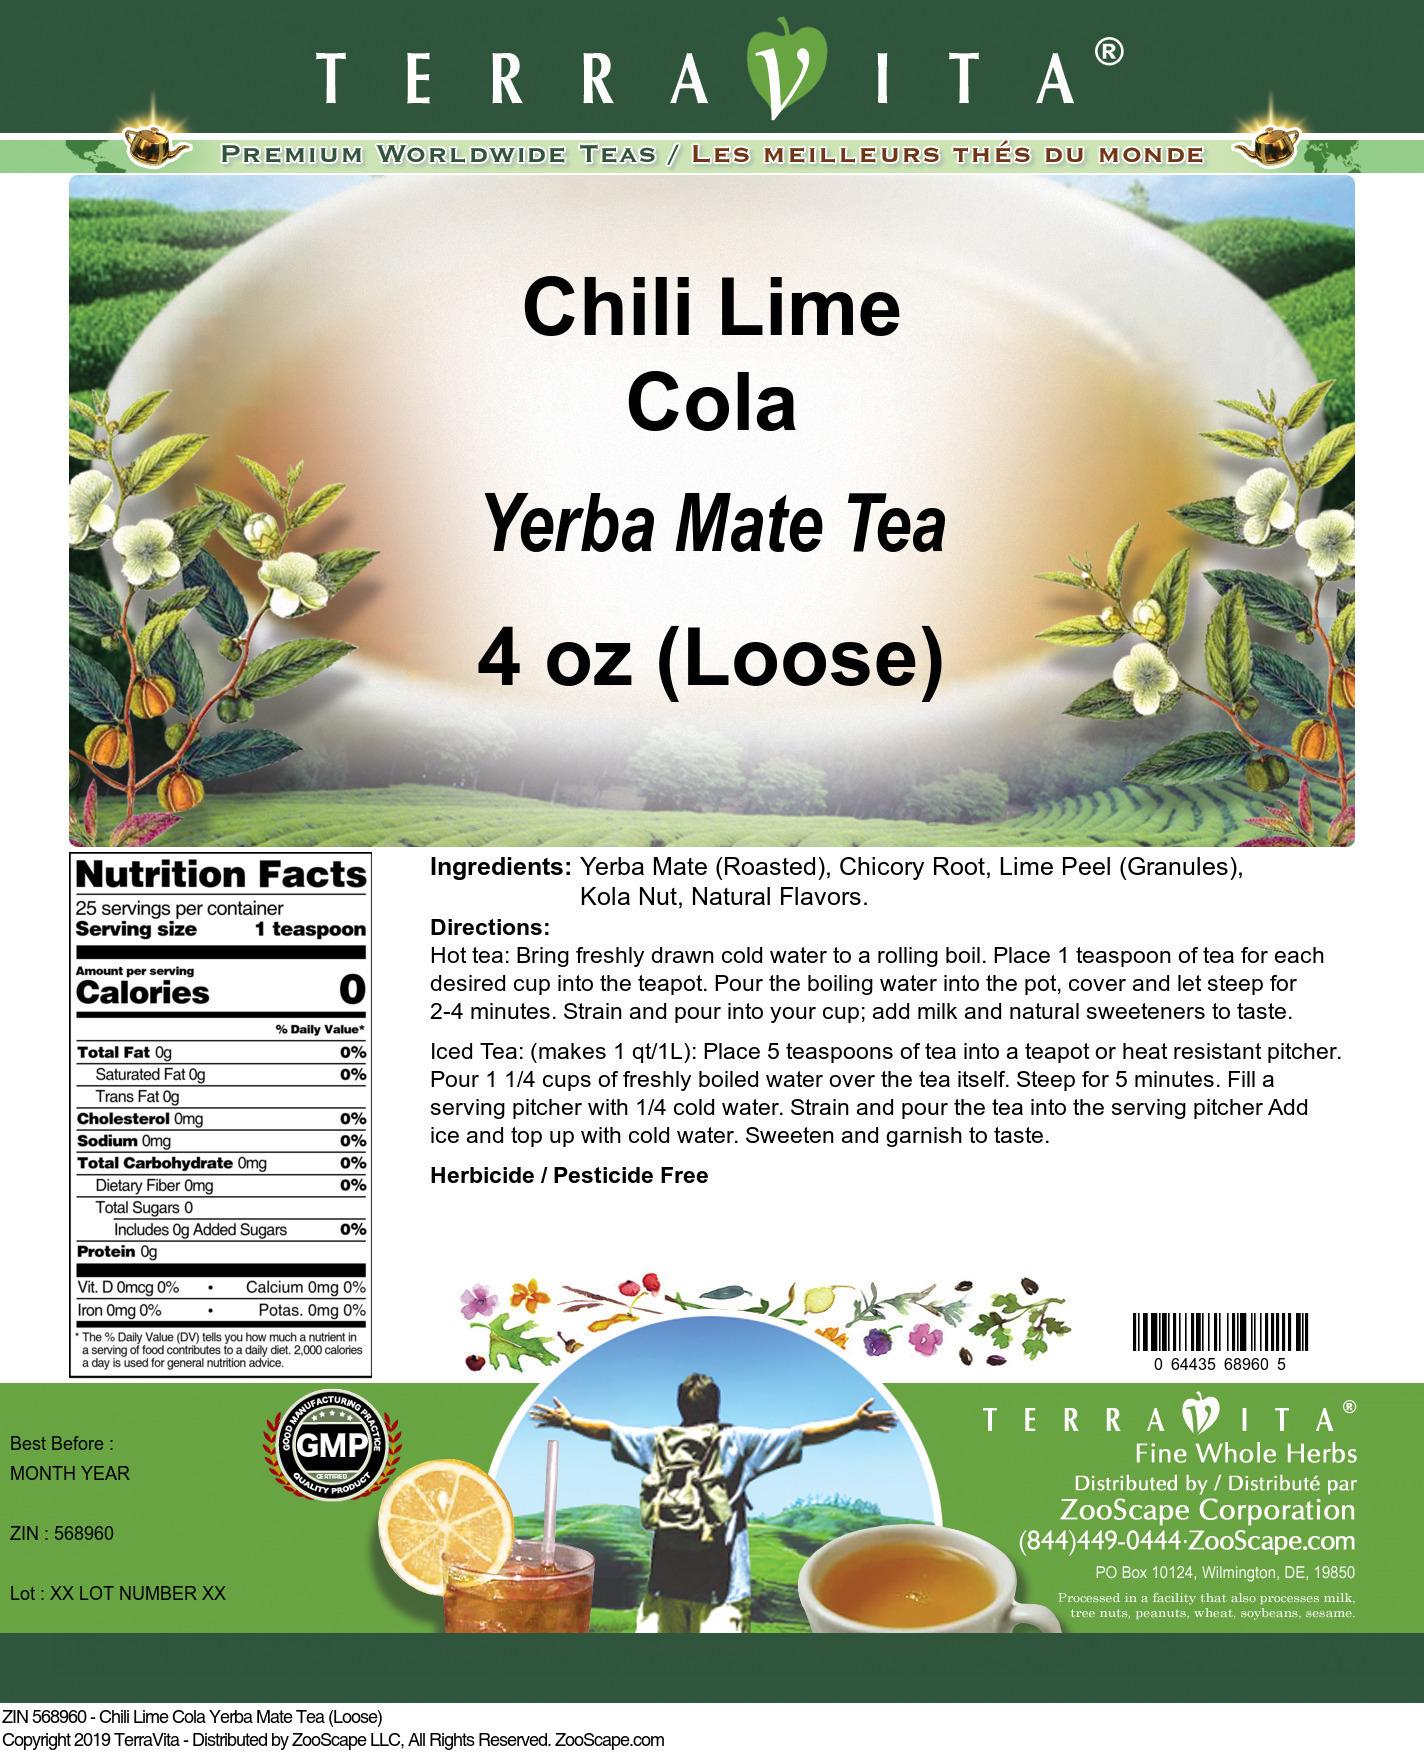 Chili Lime Cola Yerba Mate Tea (Loose)